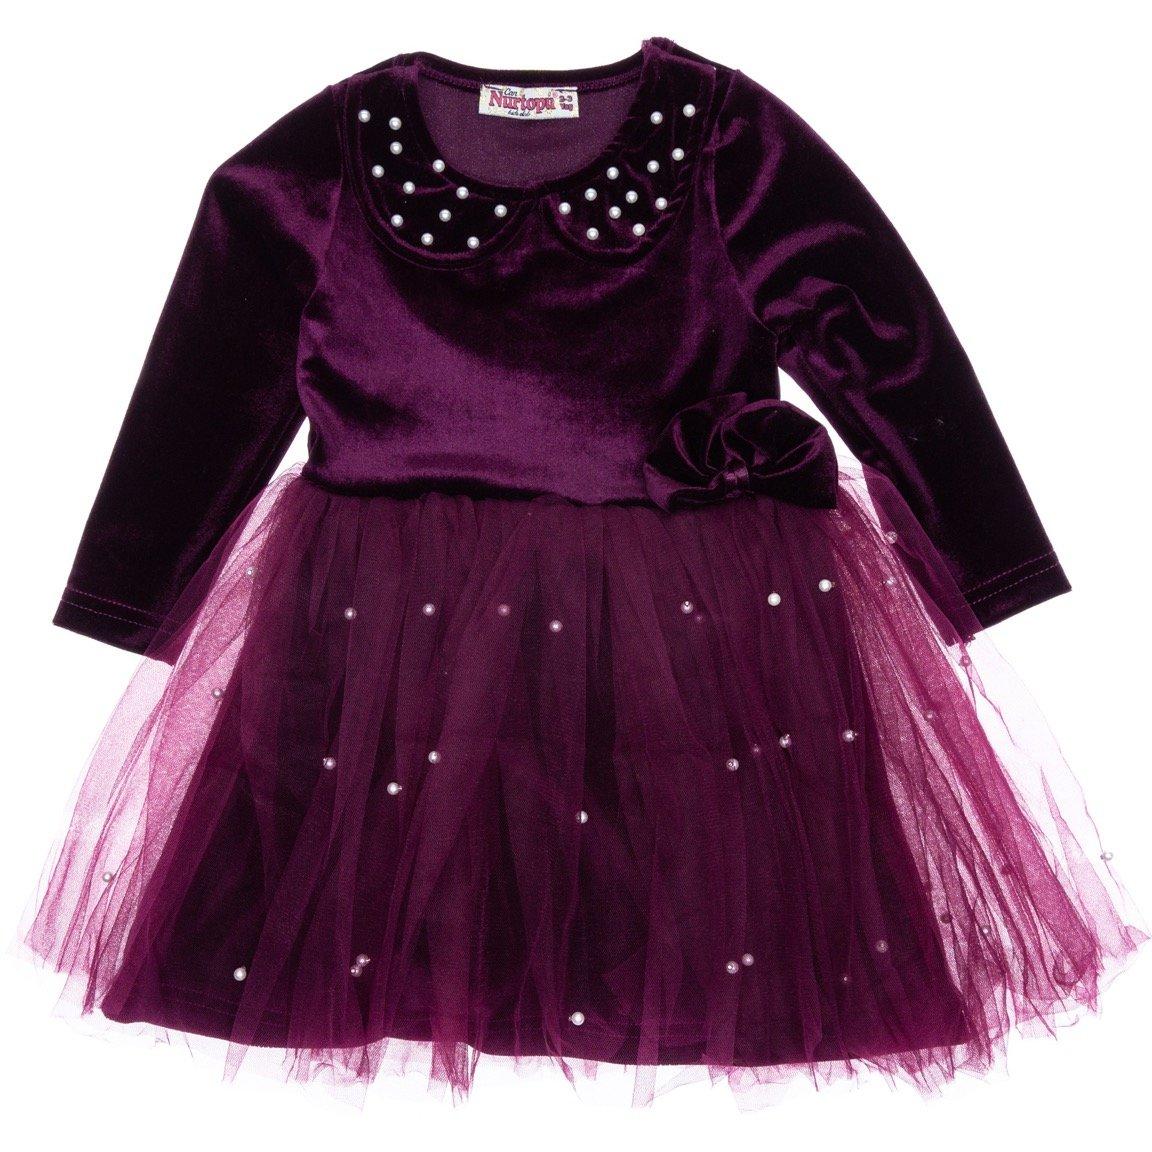 Nurtopu παιδικό αμπιγιέ βελουτέ φόρεμα «Pearl Velour»